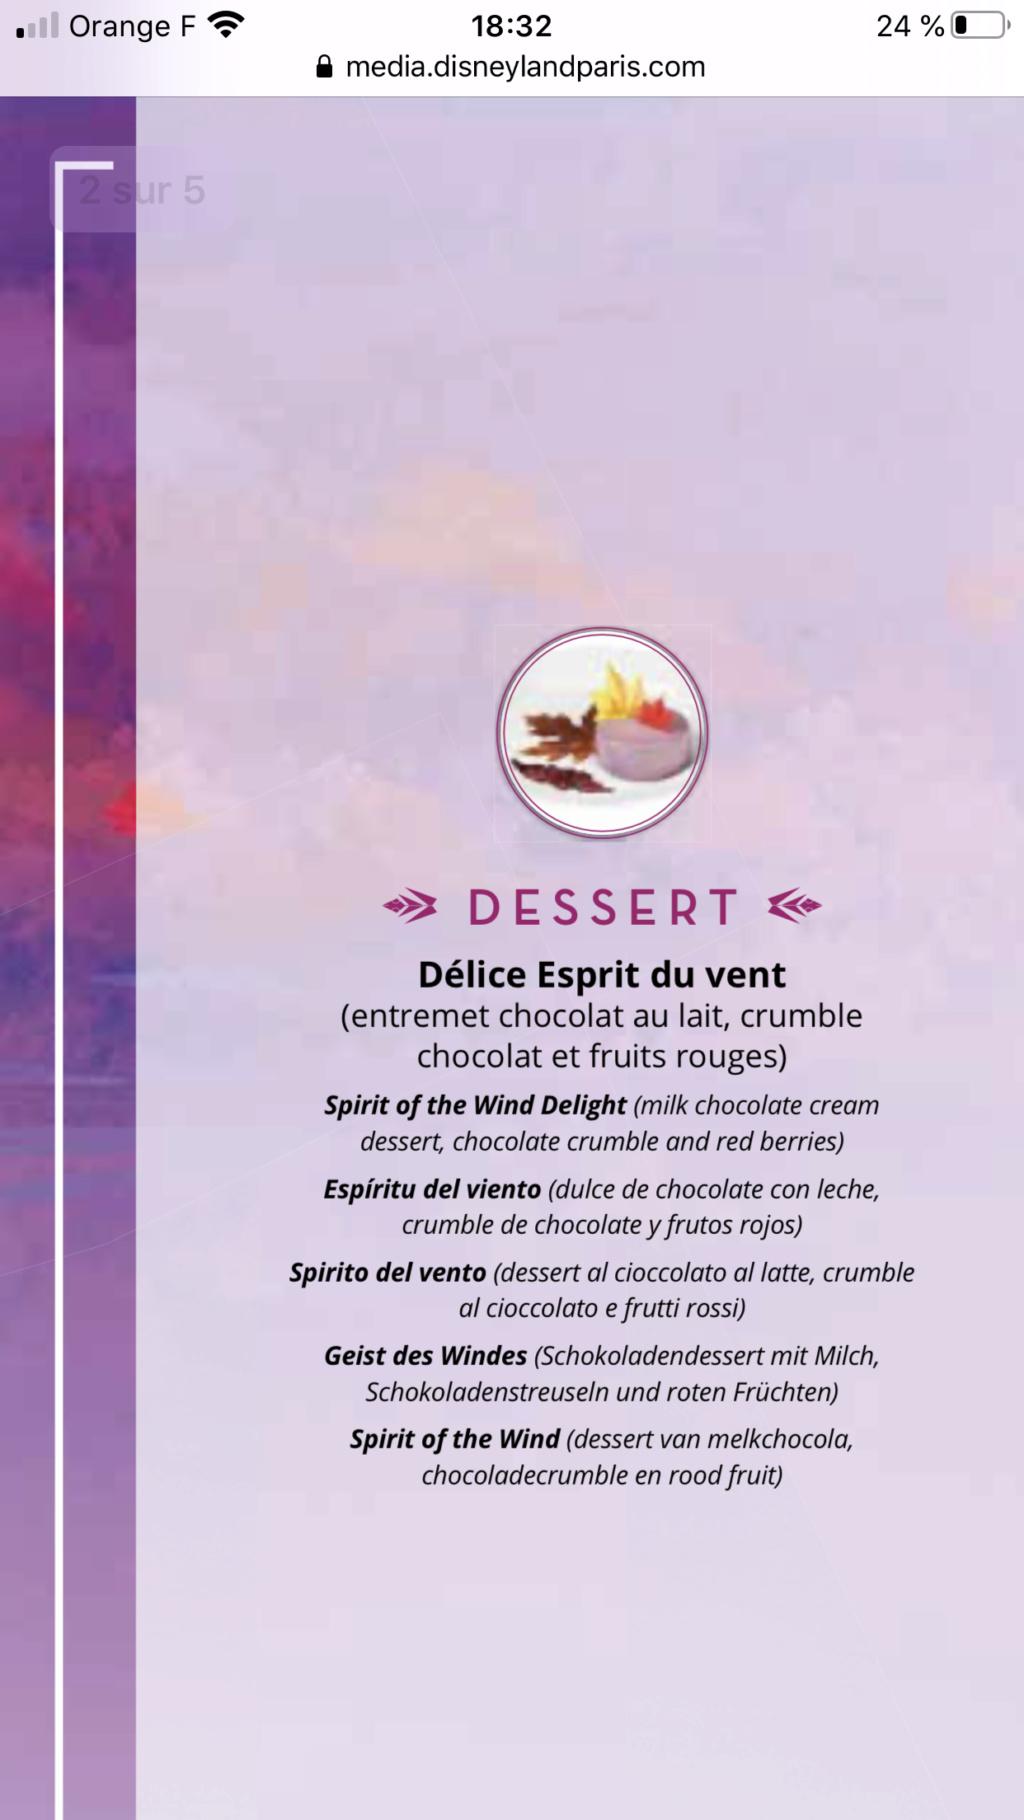 [Service à table] Auberge de Cendrillon - Page 36 5cf31910